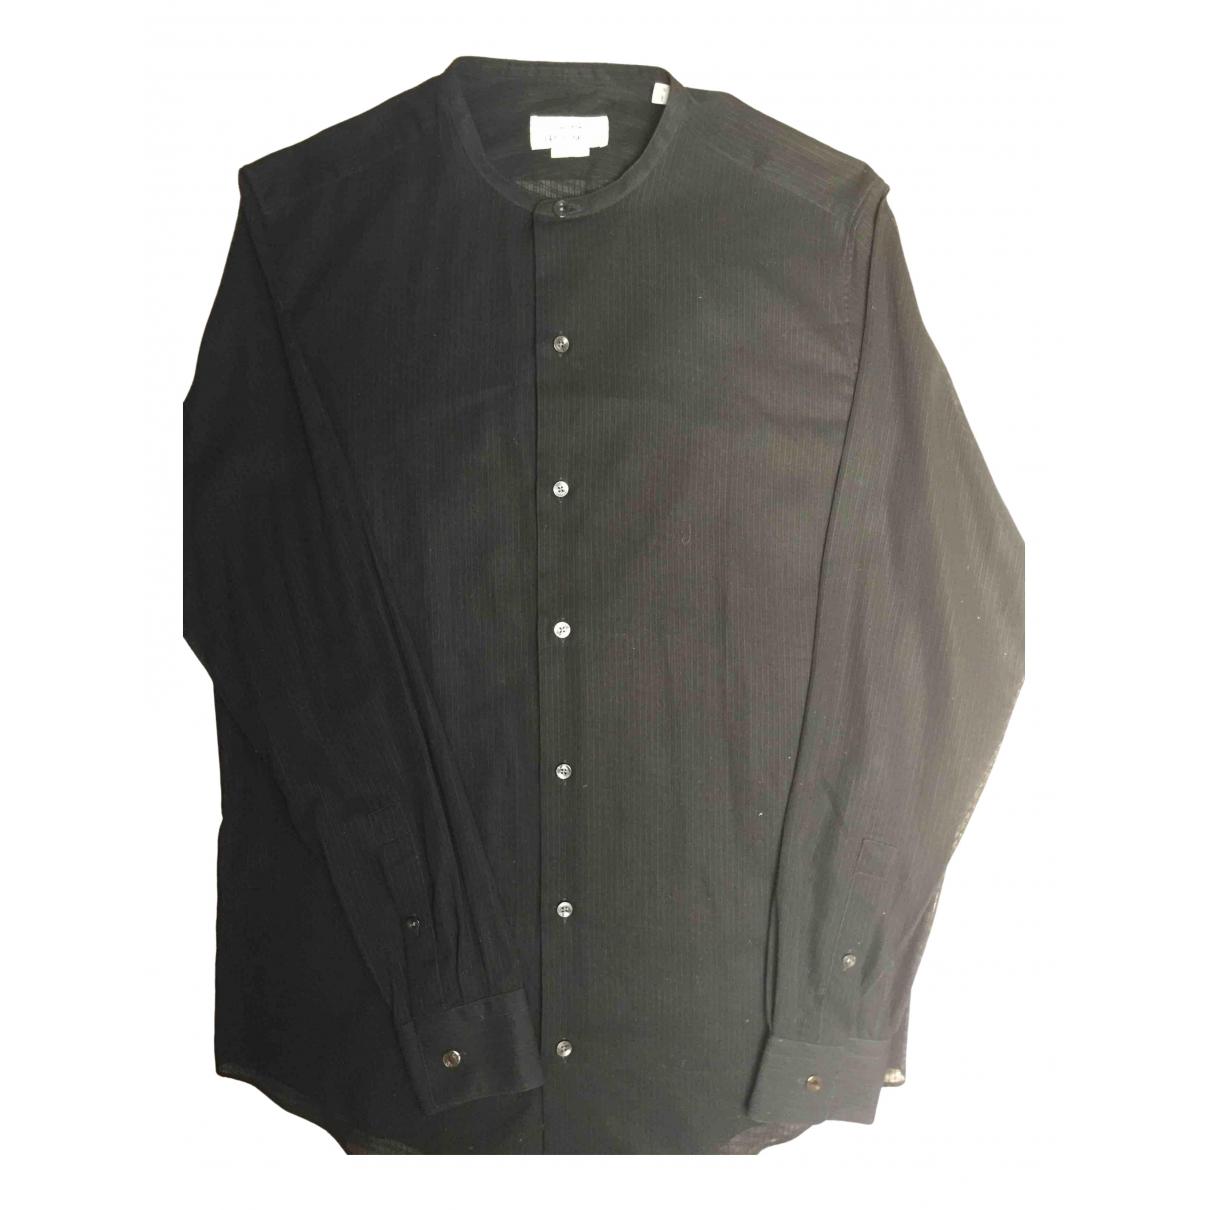 Hermes \N Hemden in  Schwarz Baumwolle